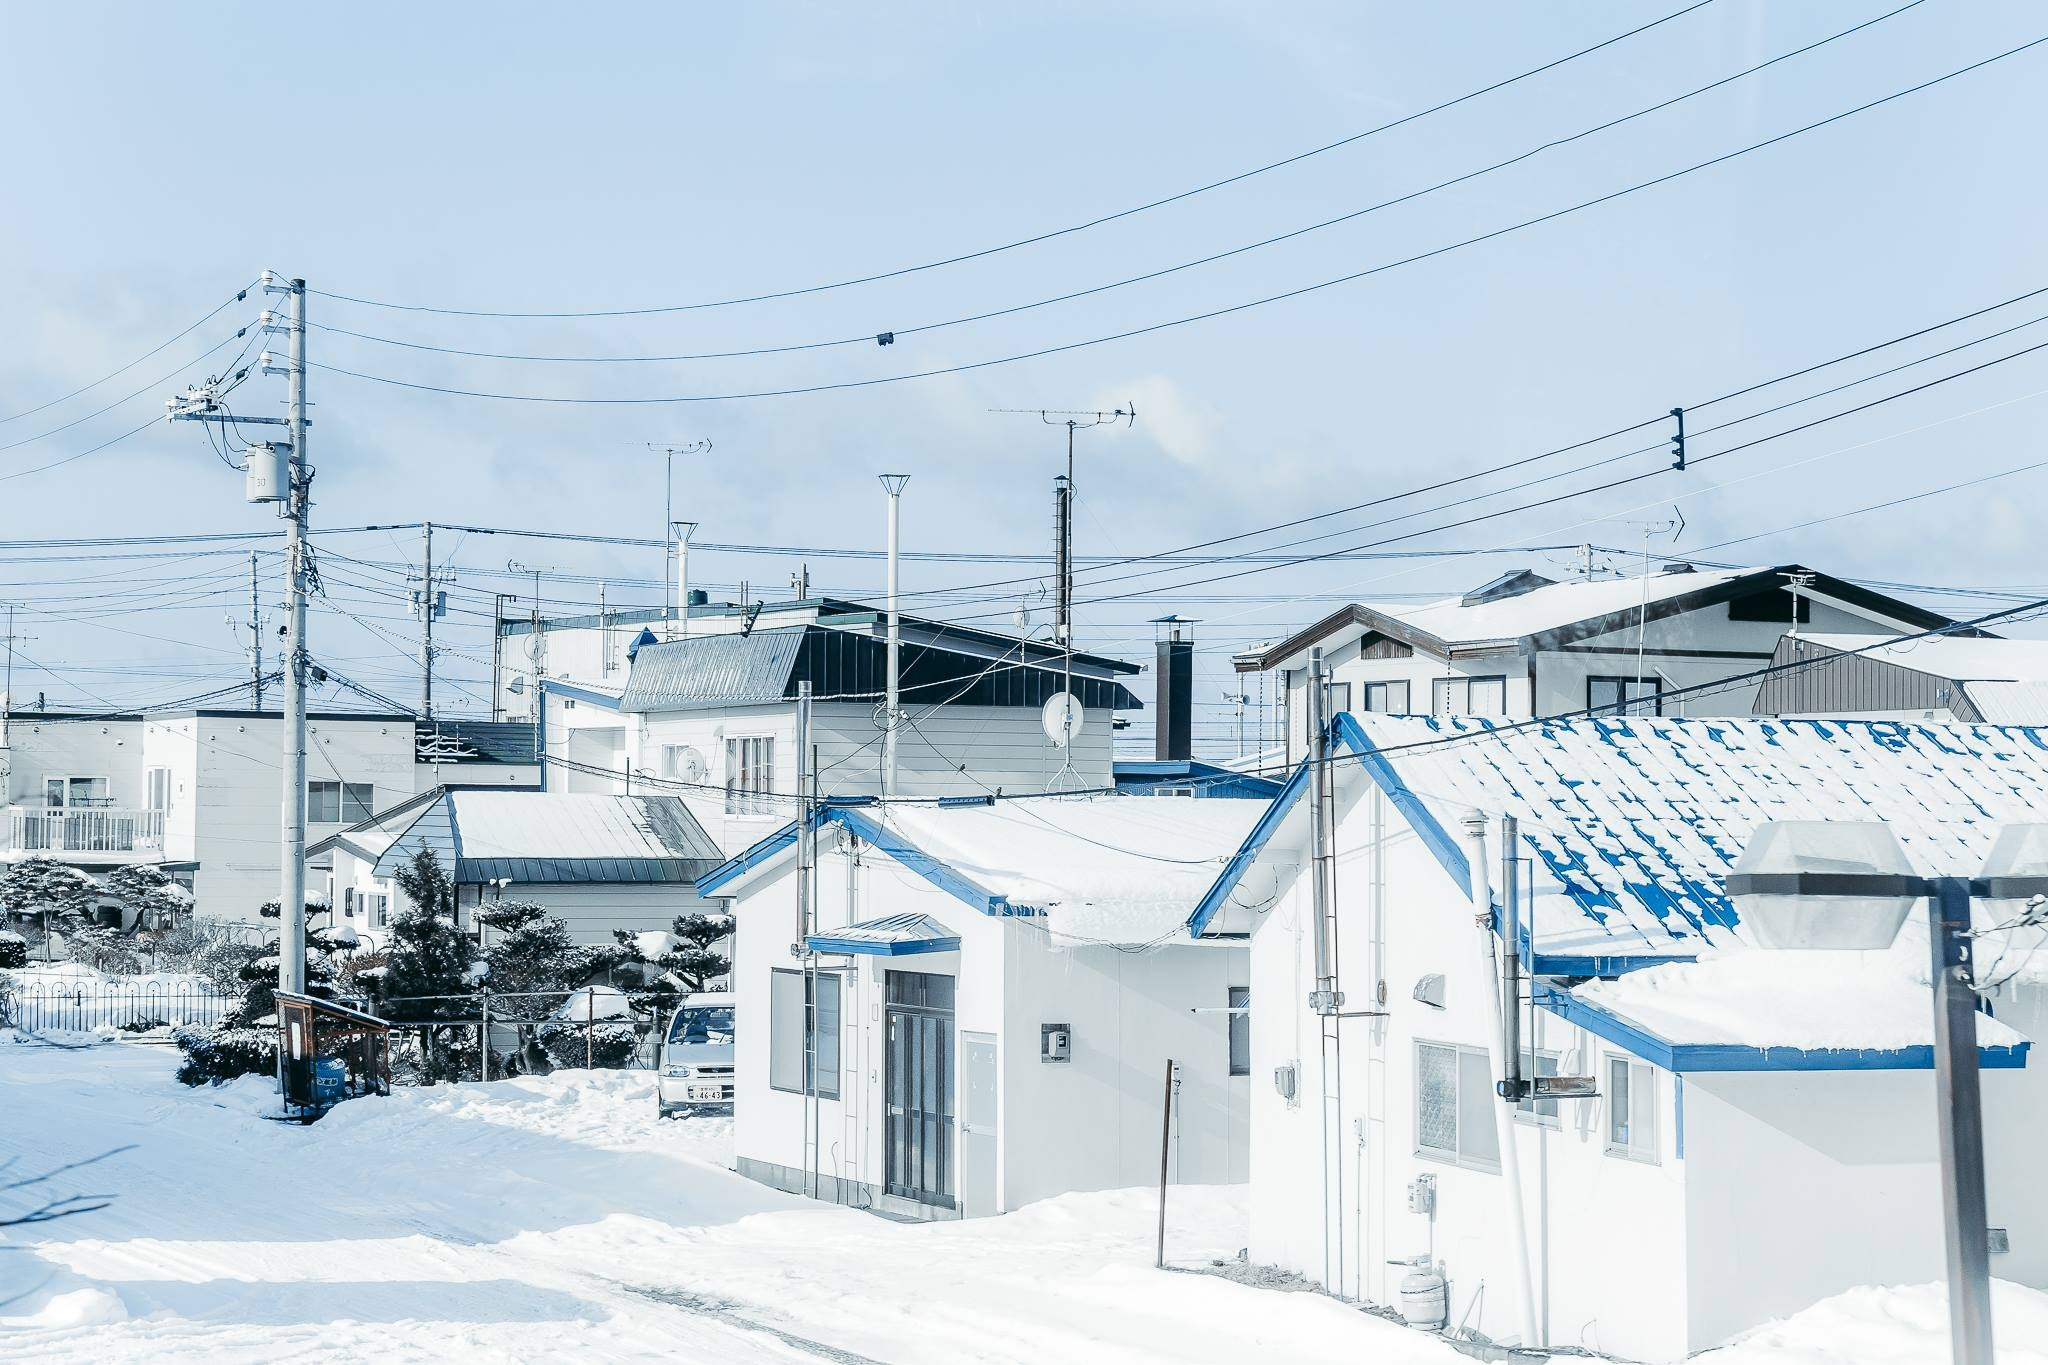 Hokkaido tuyet trang, noi dang den nhat mua dong o Nhat Ban hinh anh 25